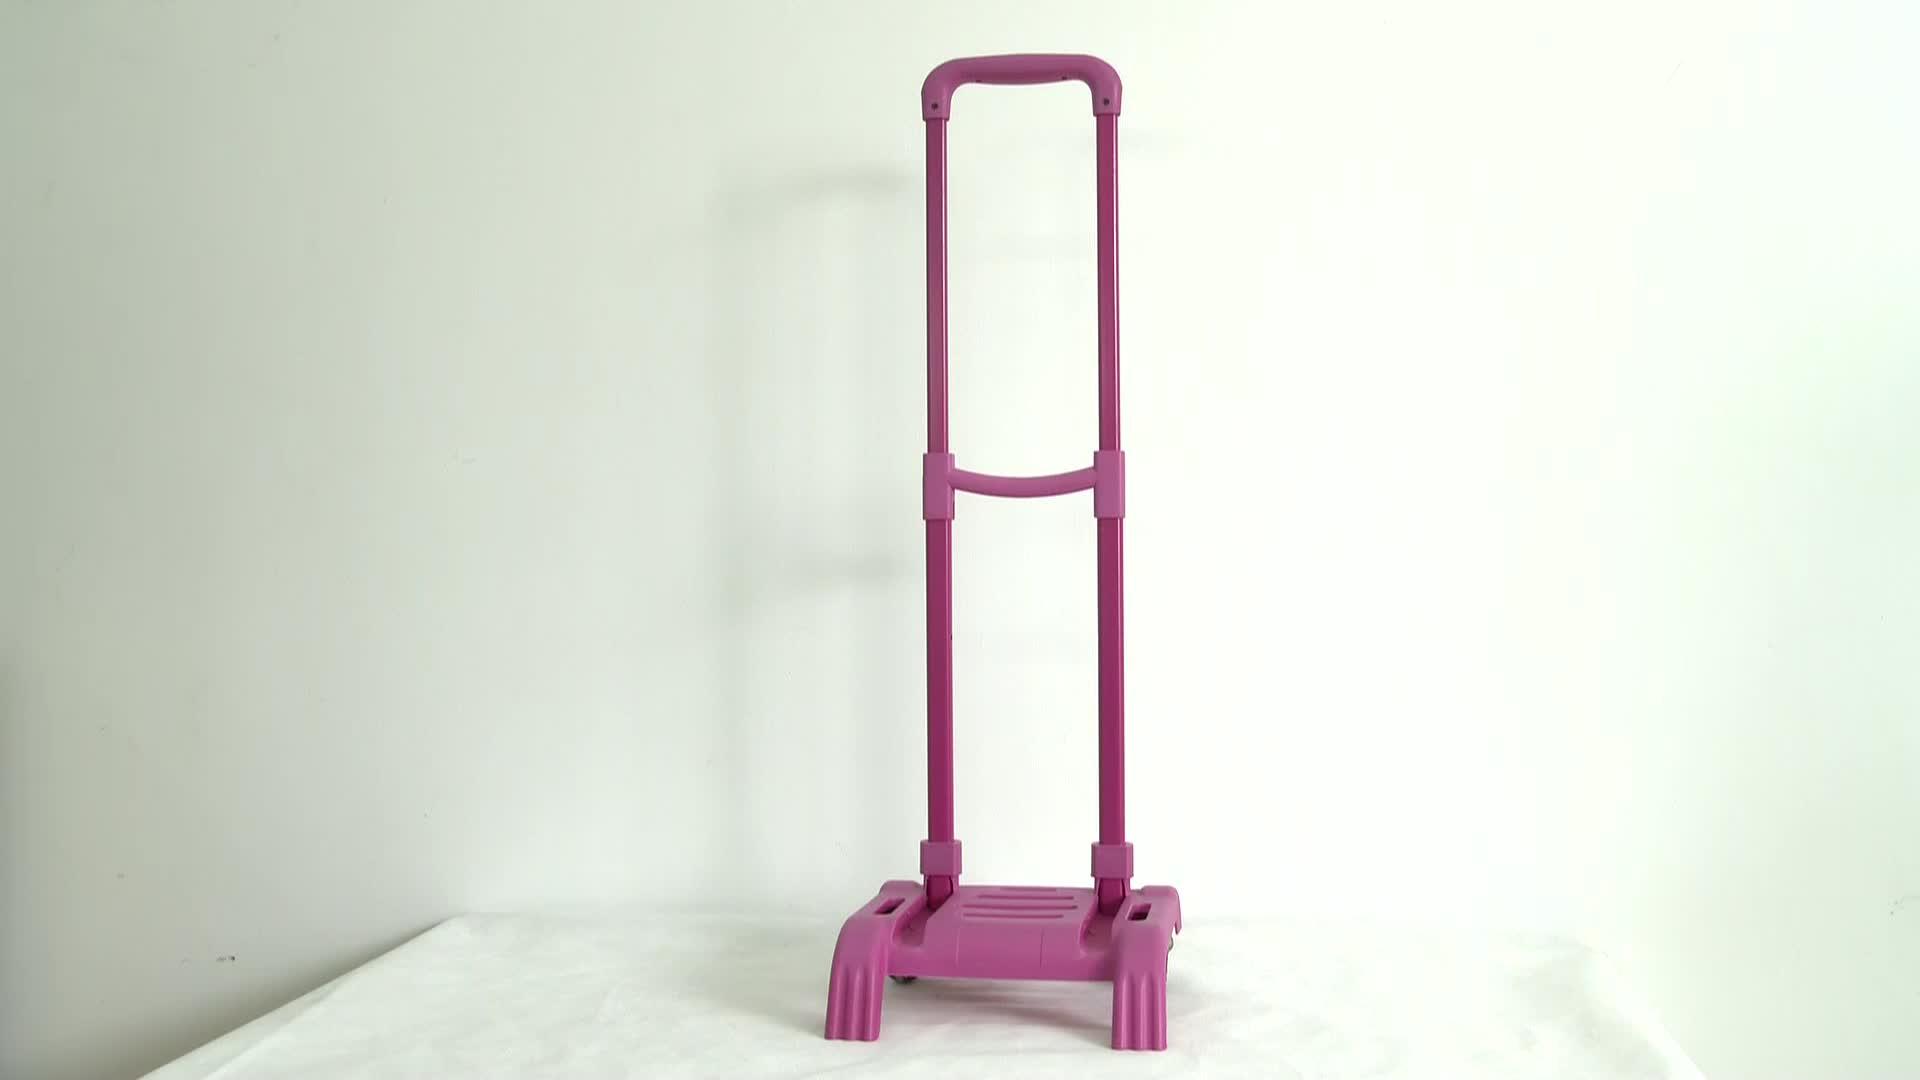 New design wheeled suitcases aluminium foldable luggage trolley, travel house luggage trolley